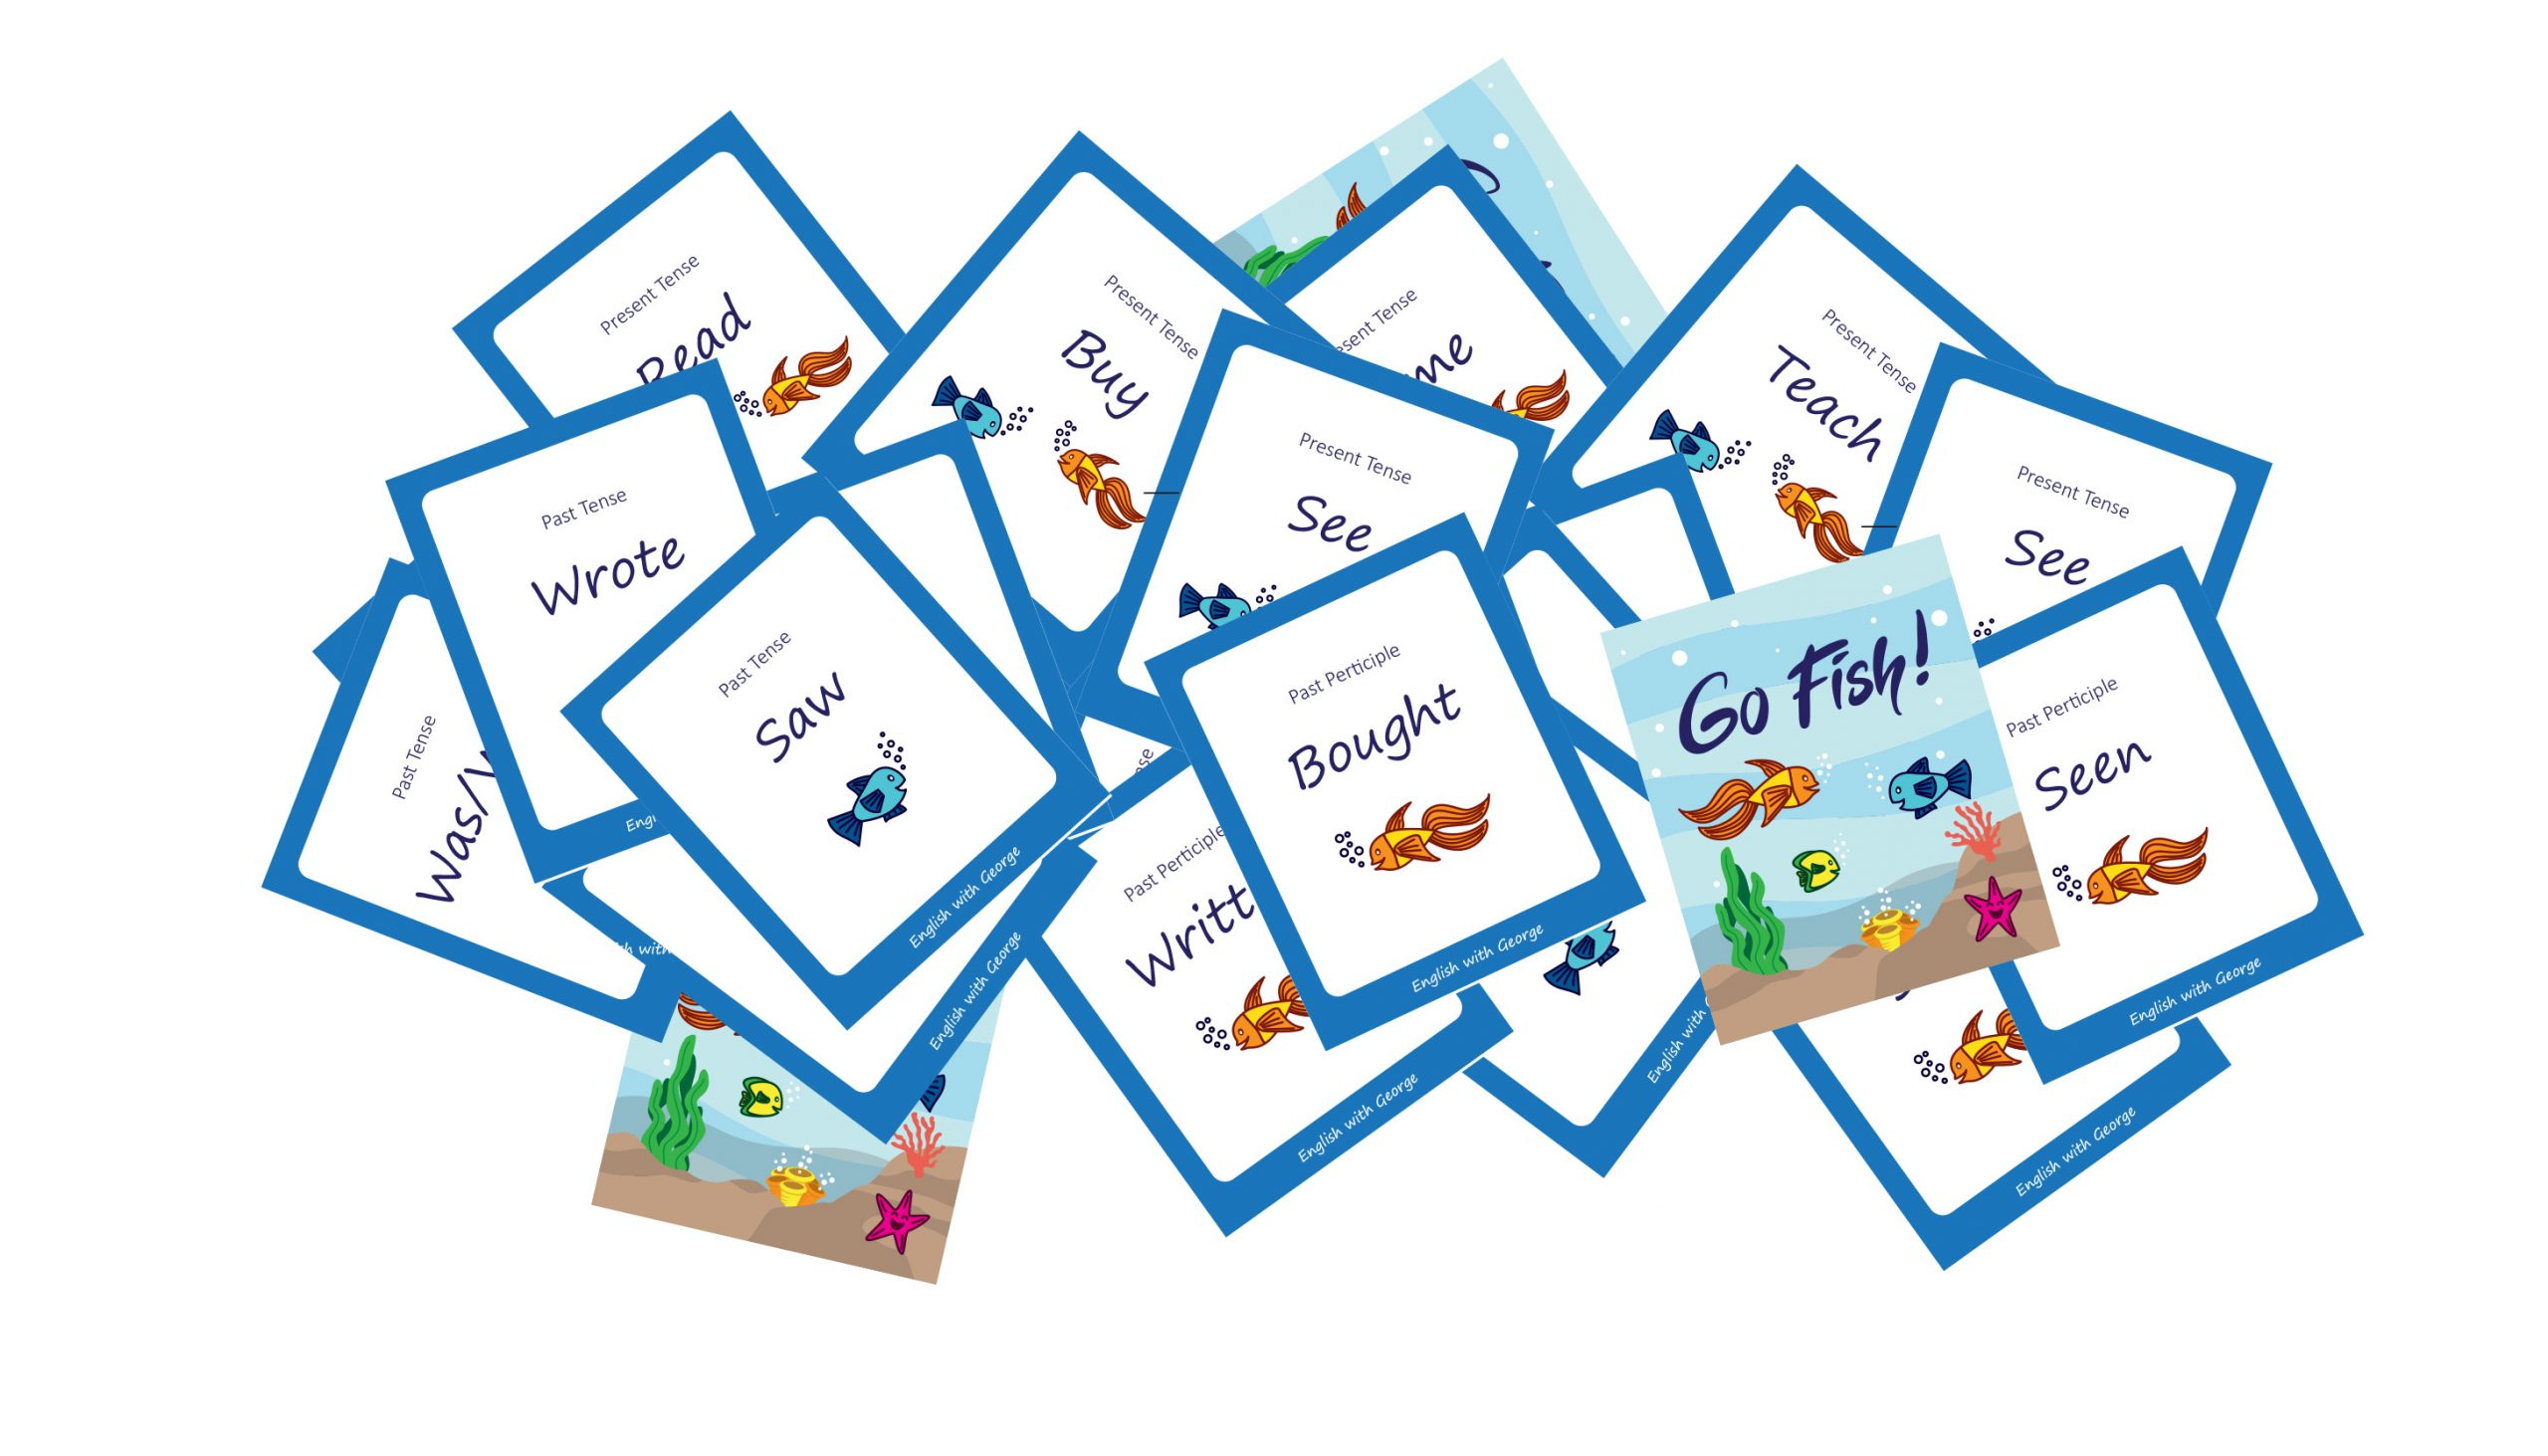 Go-Fish-Irregular-Verbs-Card-Game